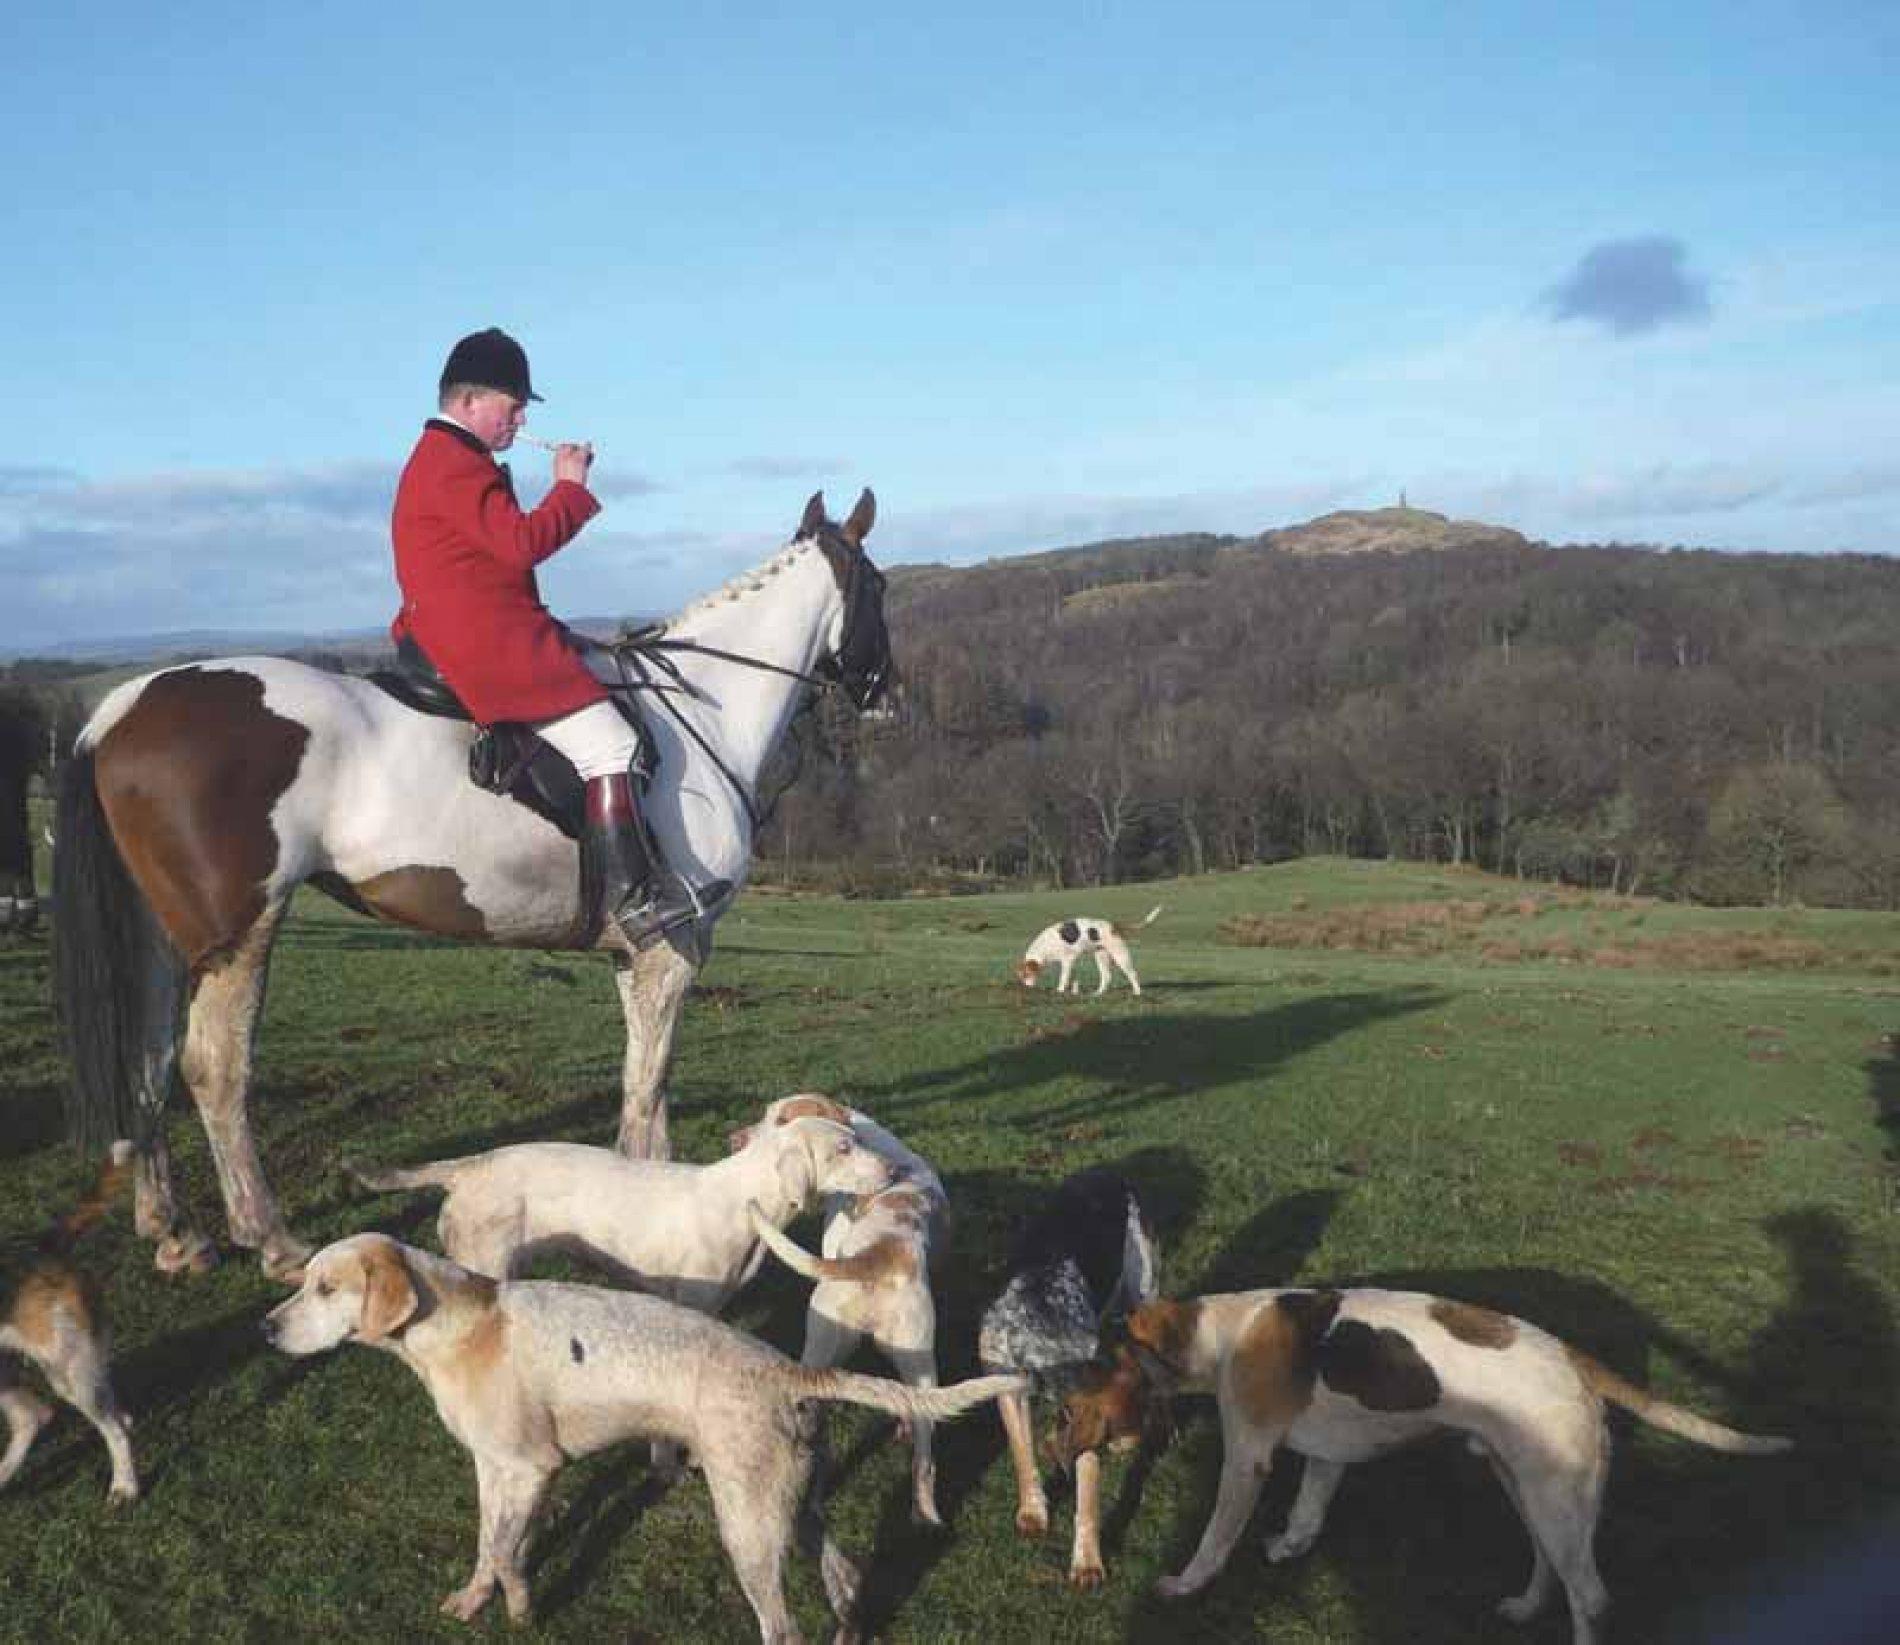 Fin de semana de caza y campo en Escocia